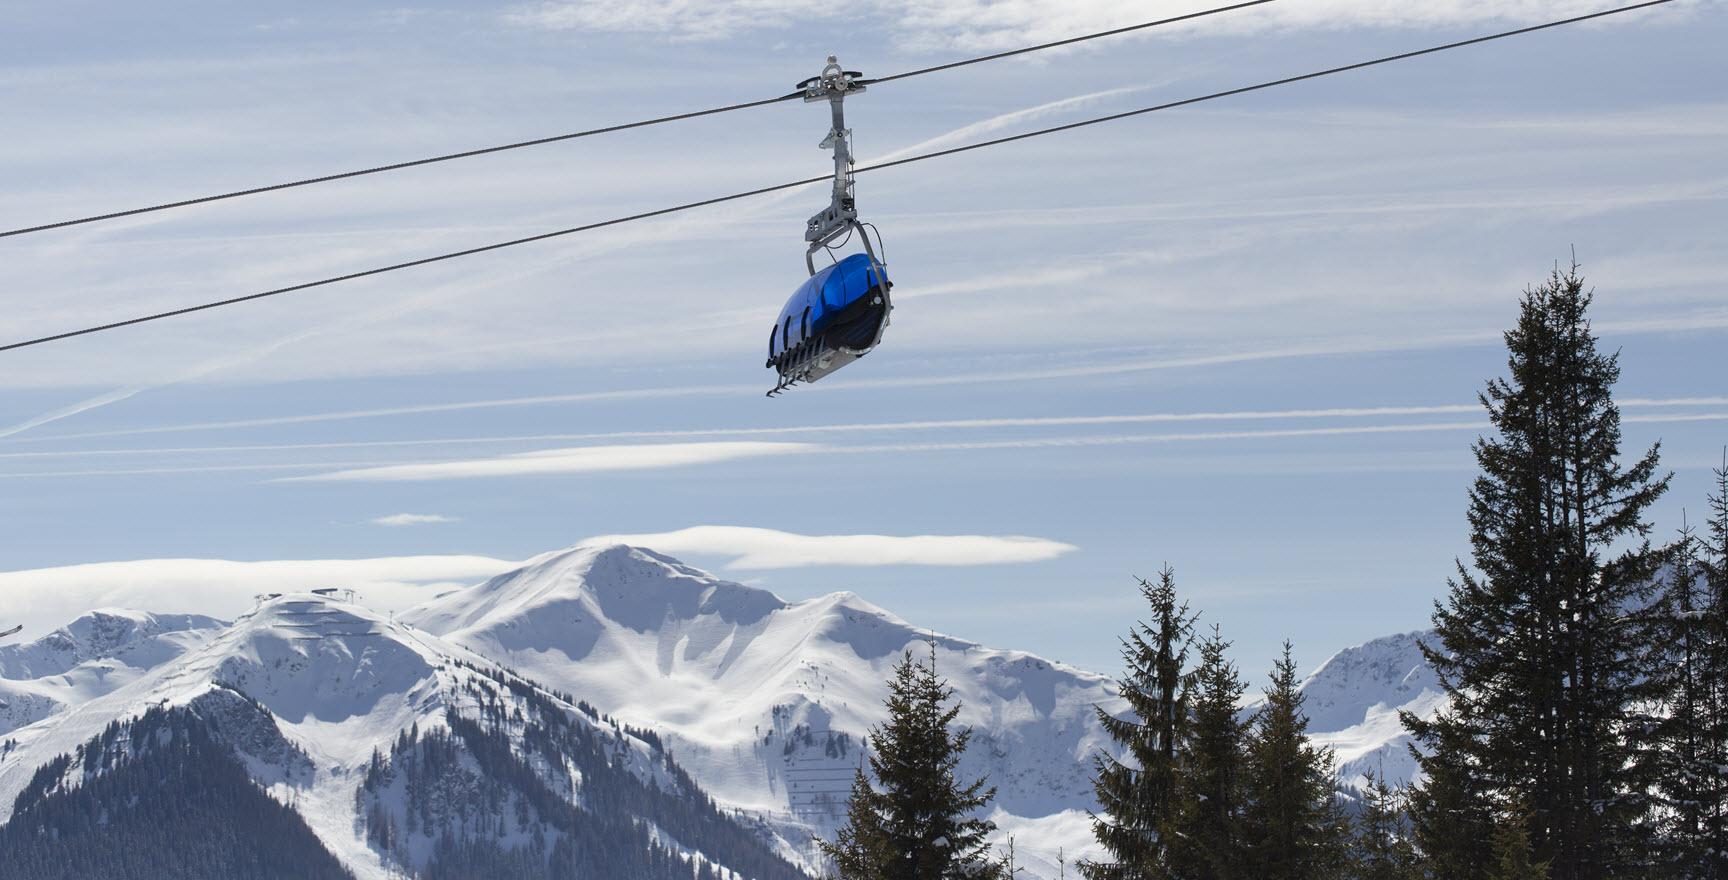 Saalbach Hinterglemm skilift